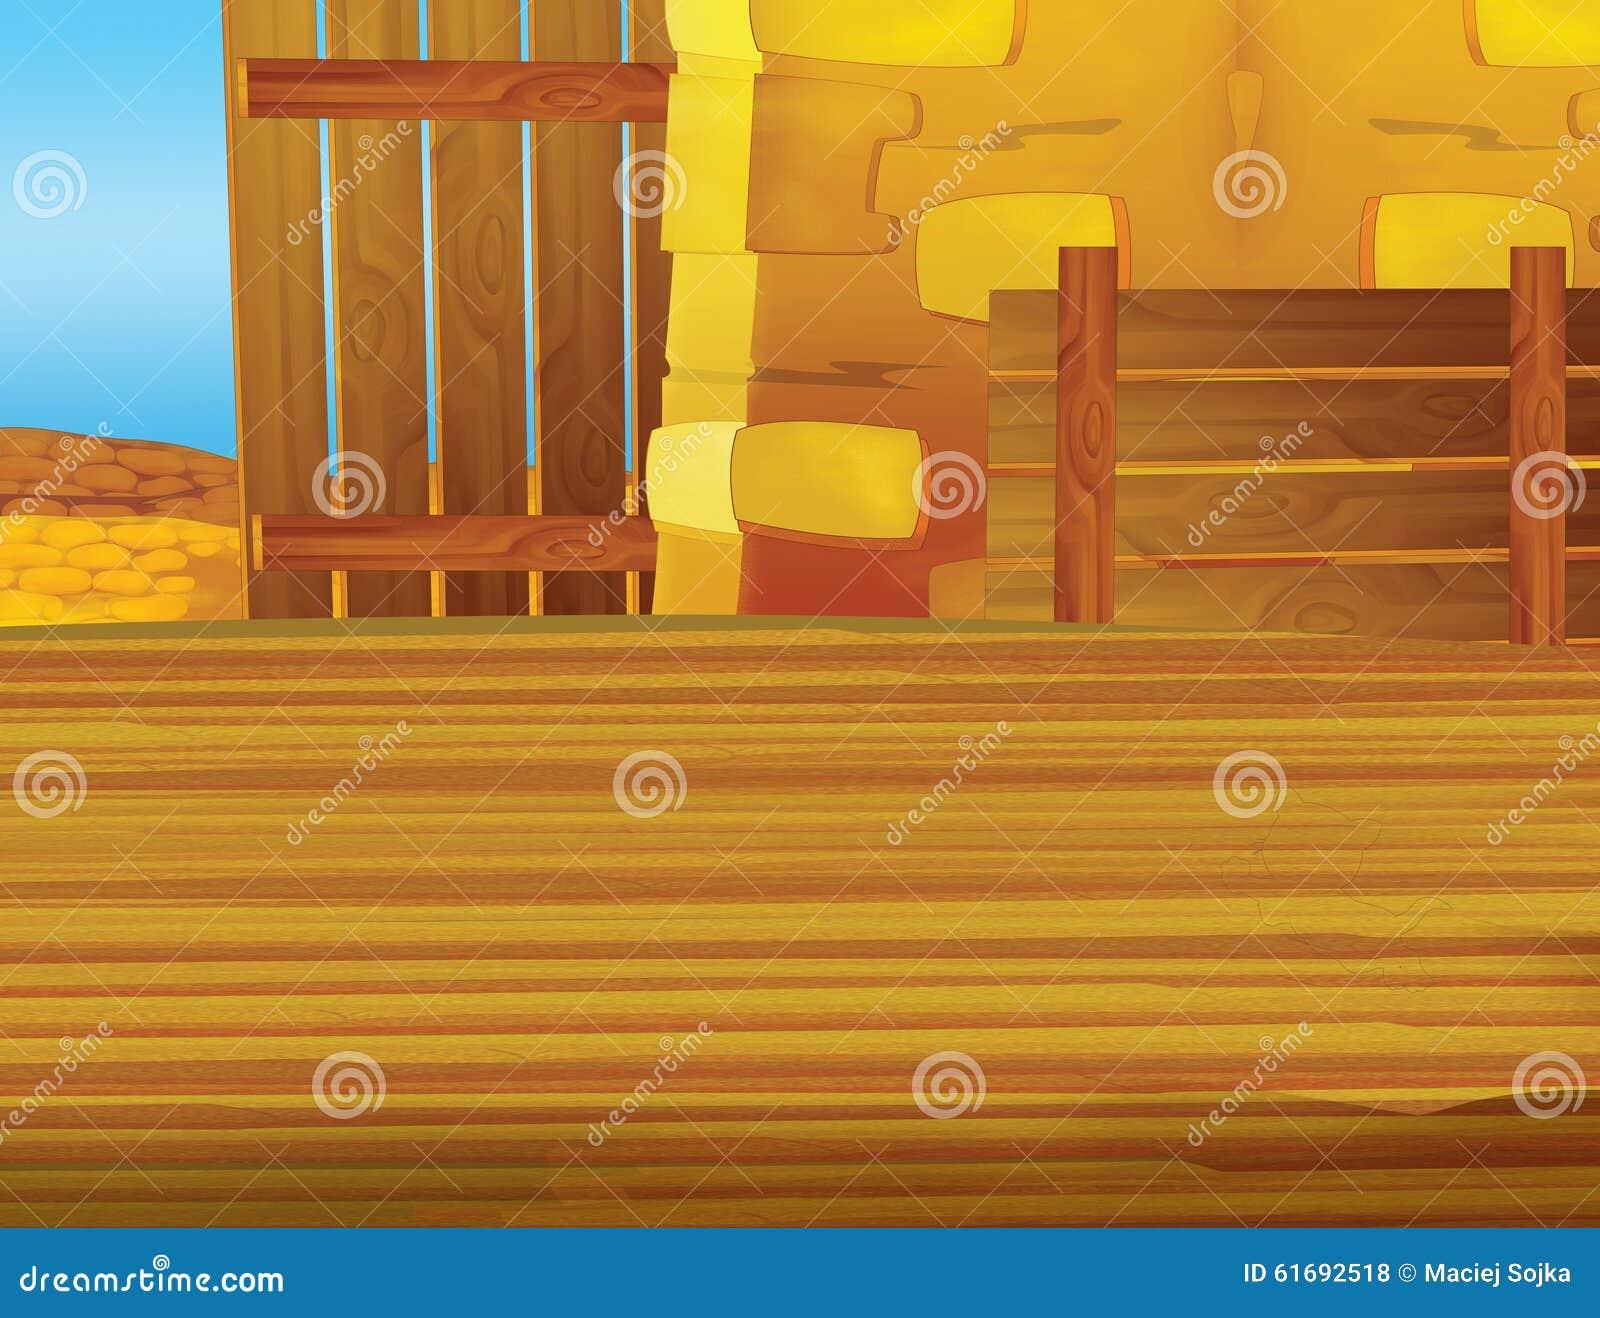 cartoon farm scene with wooden barn interior background stock